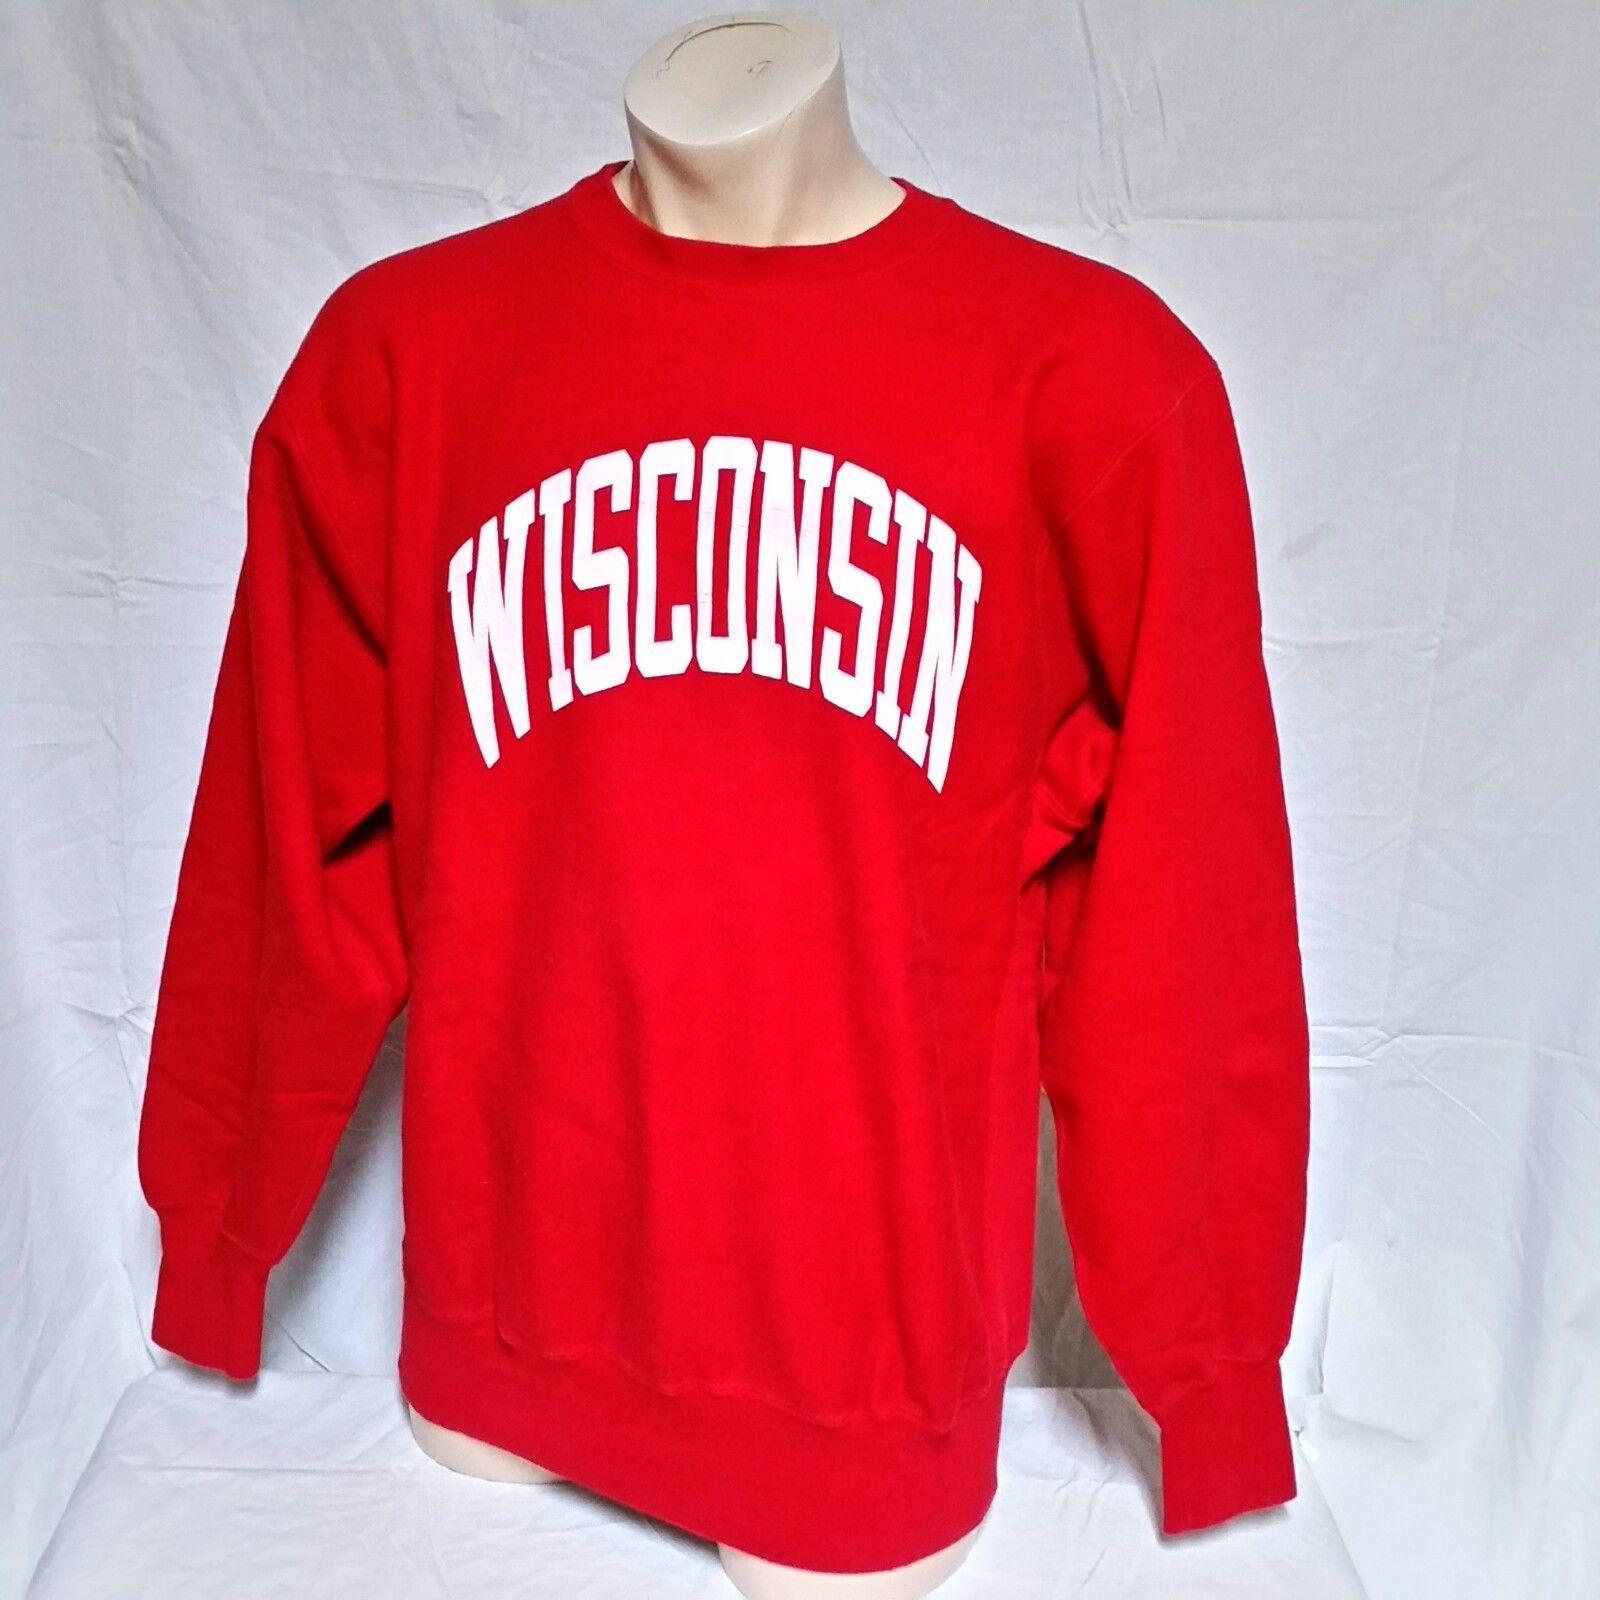 VTG Wisconsin Badgers Champion Reverse Weave Sweatshirt Crew Neck Jumper XXL 2XL